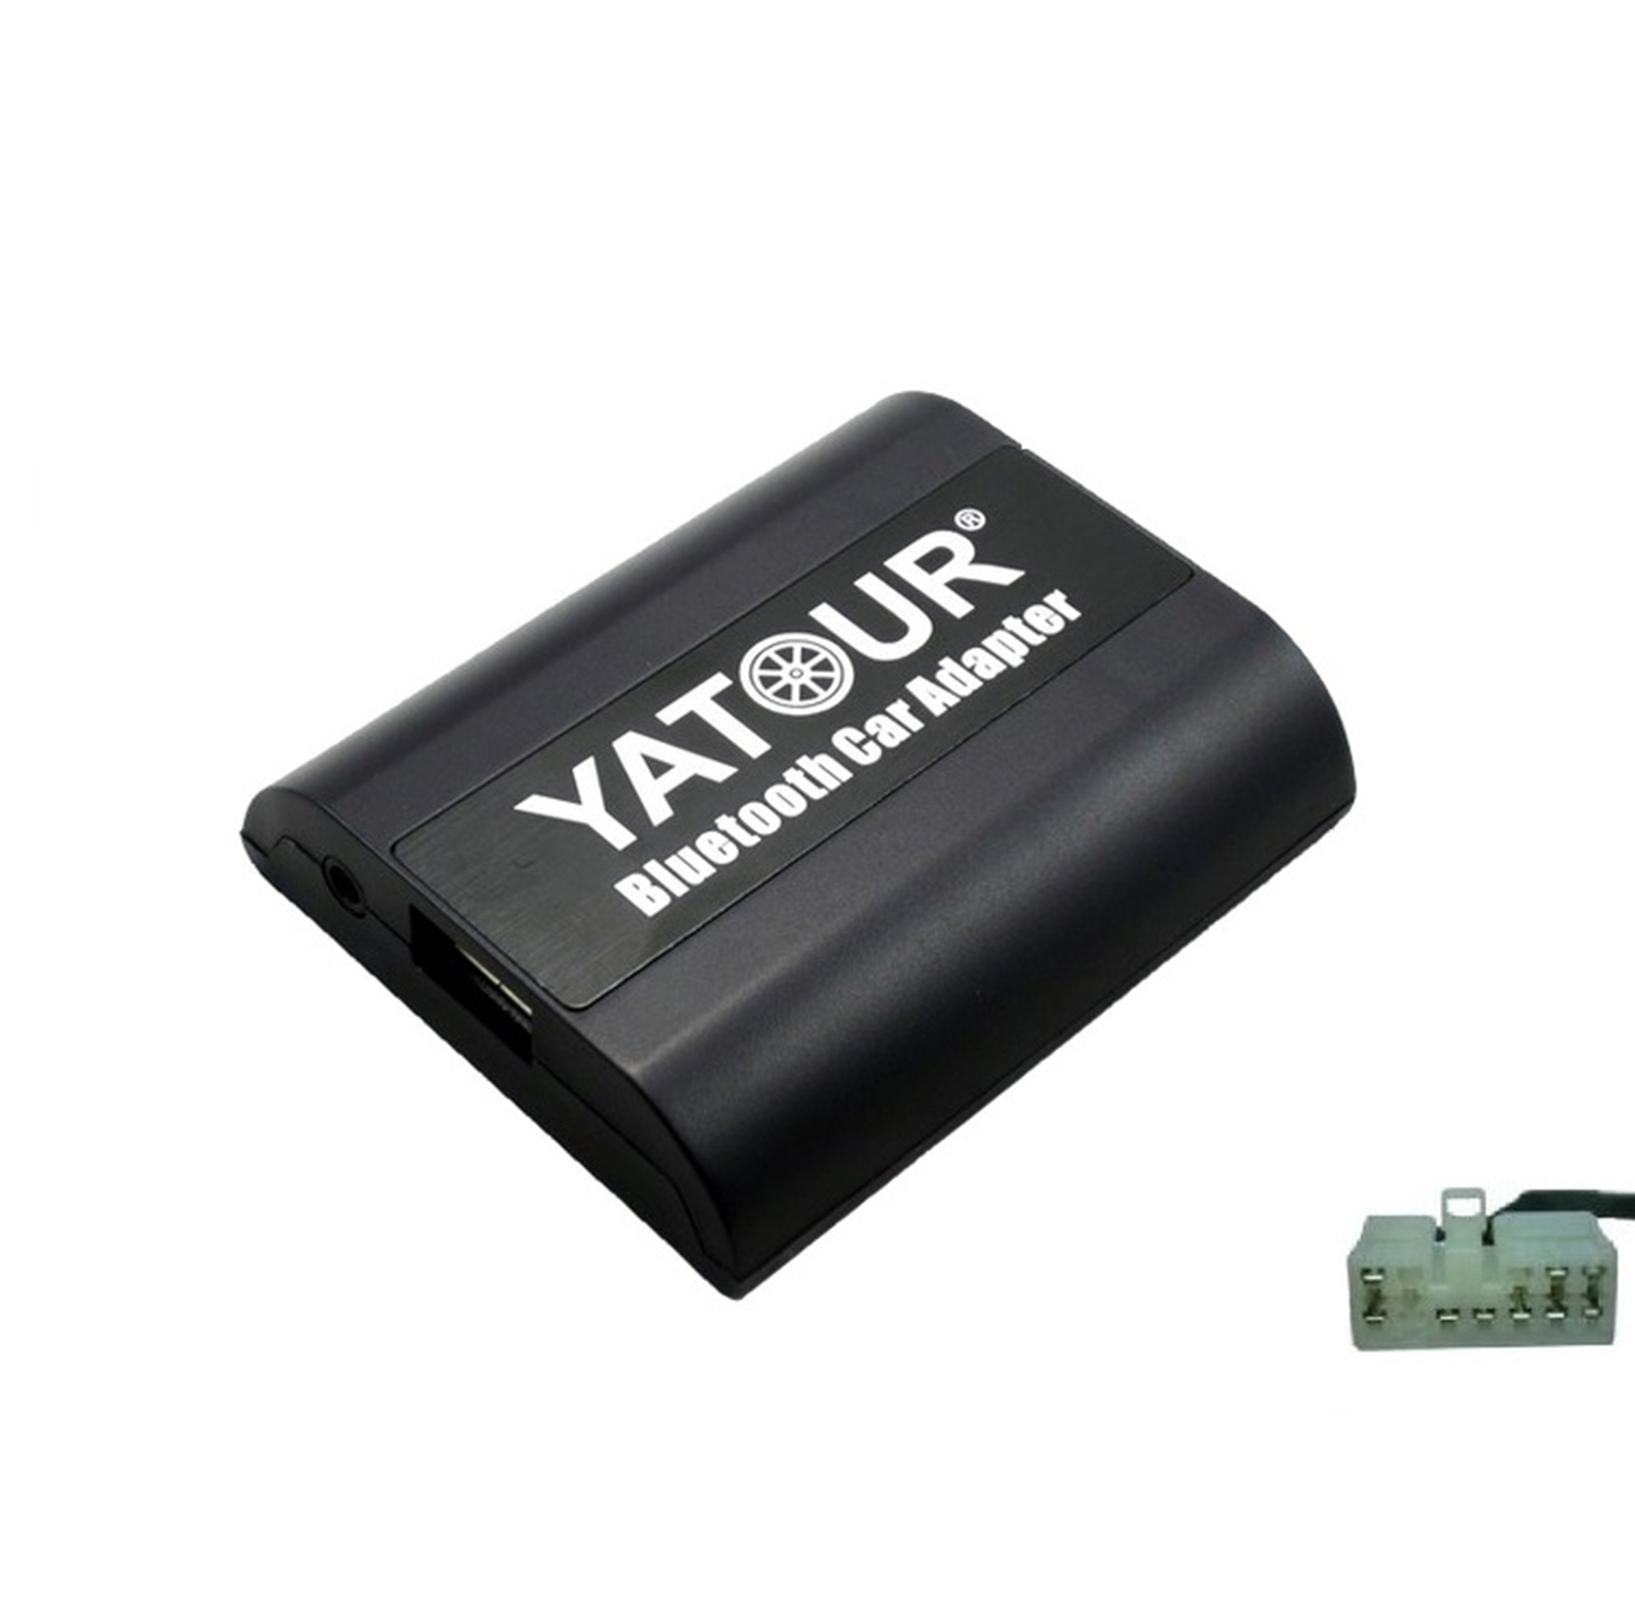 Kit Mains libres Bluetooth et streaming audio pour Toyota Avensis, Corolla Verso, Highlander, Land Cruiser, MR2, RAV4, Yaris et Matrix (5+7)